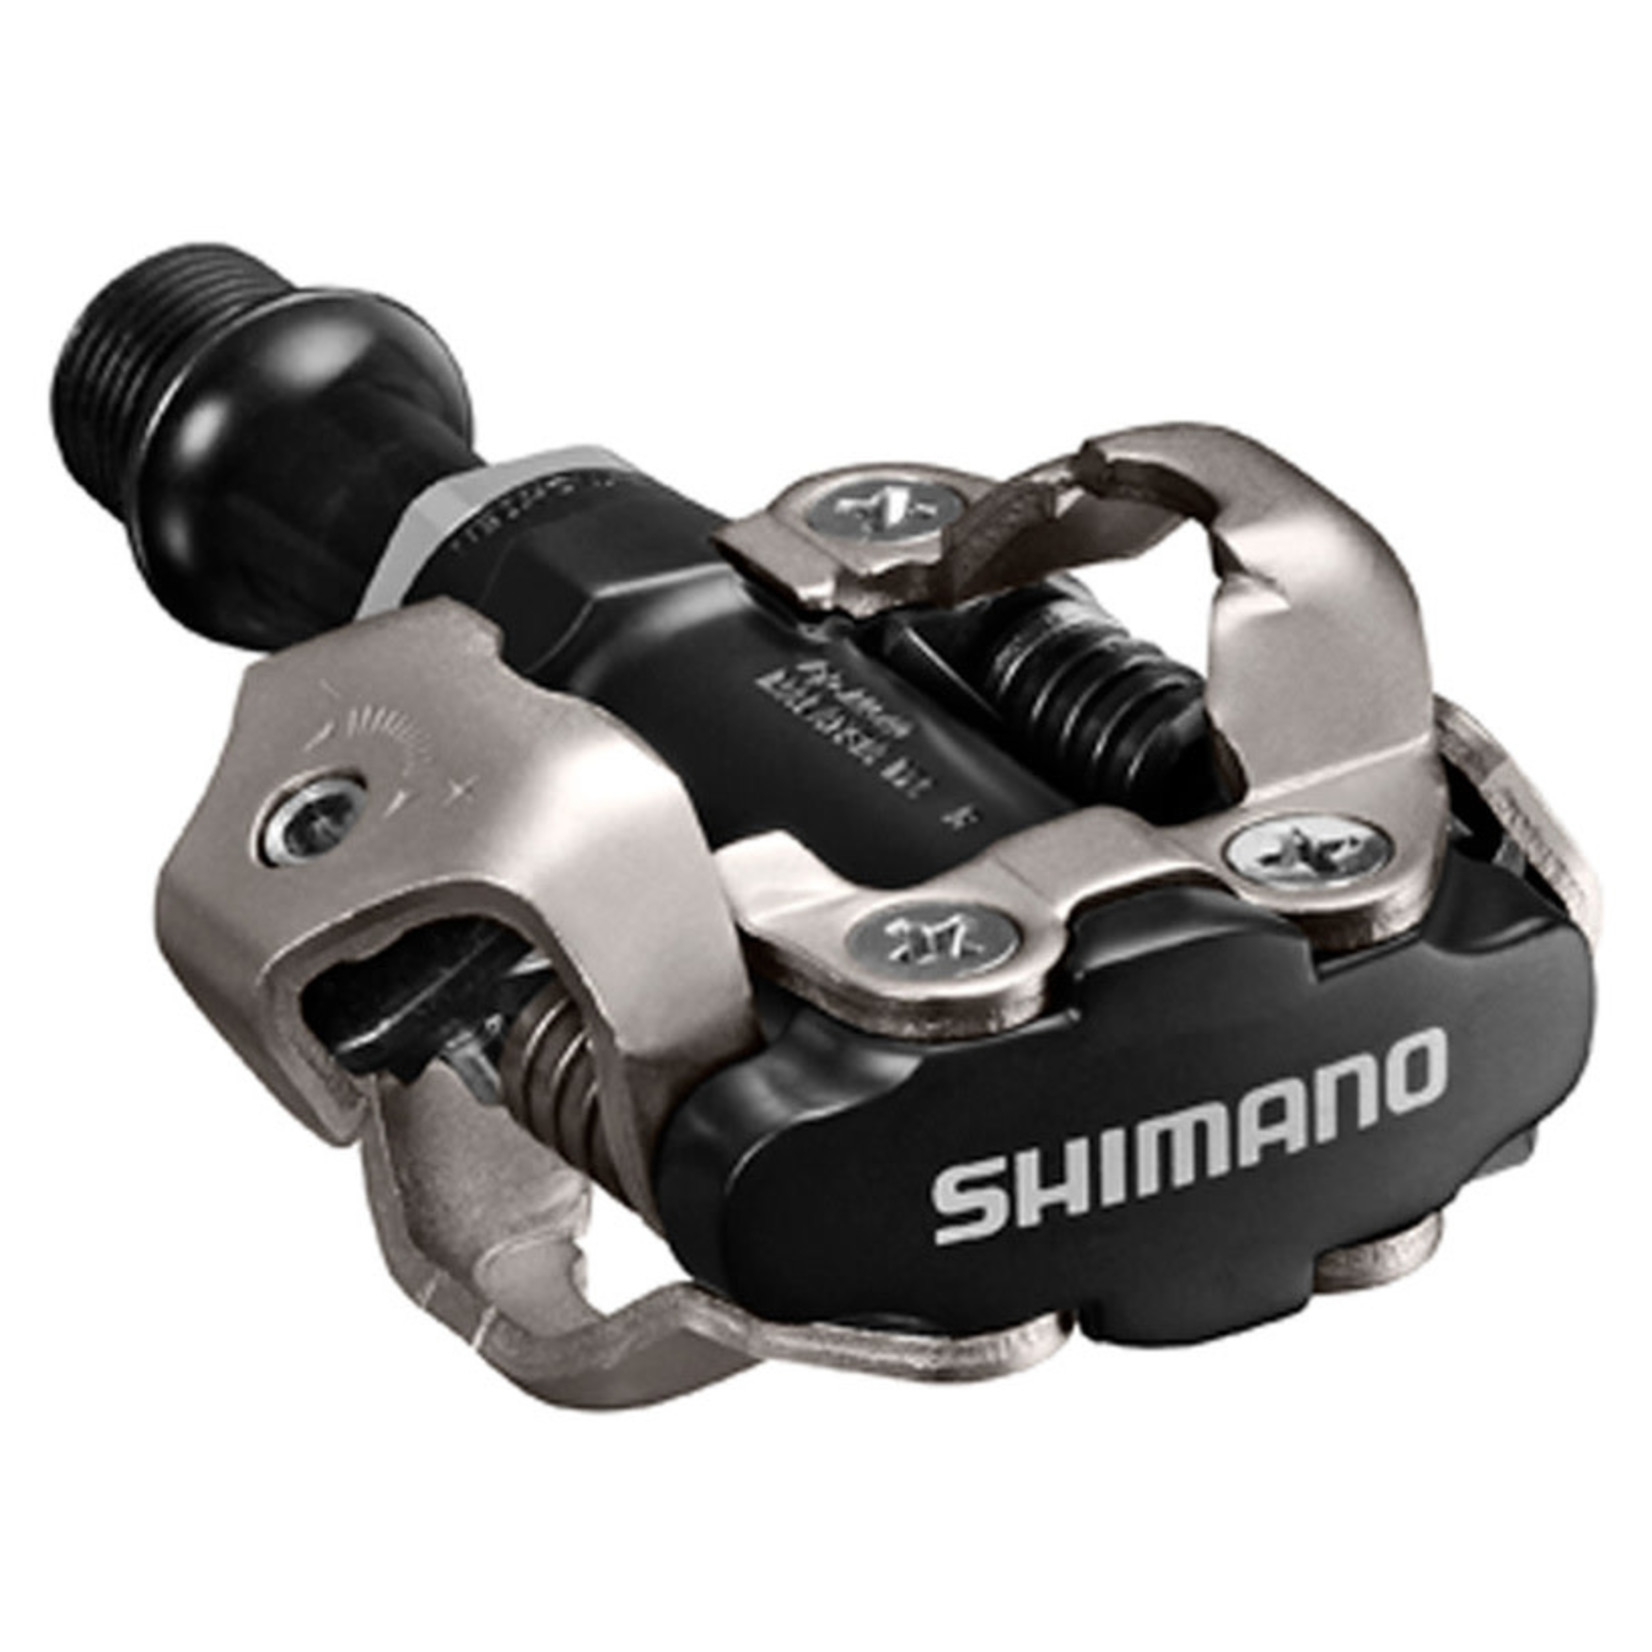 Shimano Shimano SPD PD-M540 Pedals